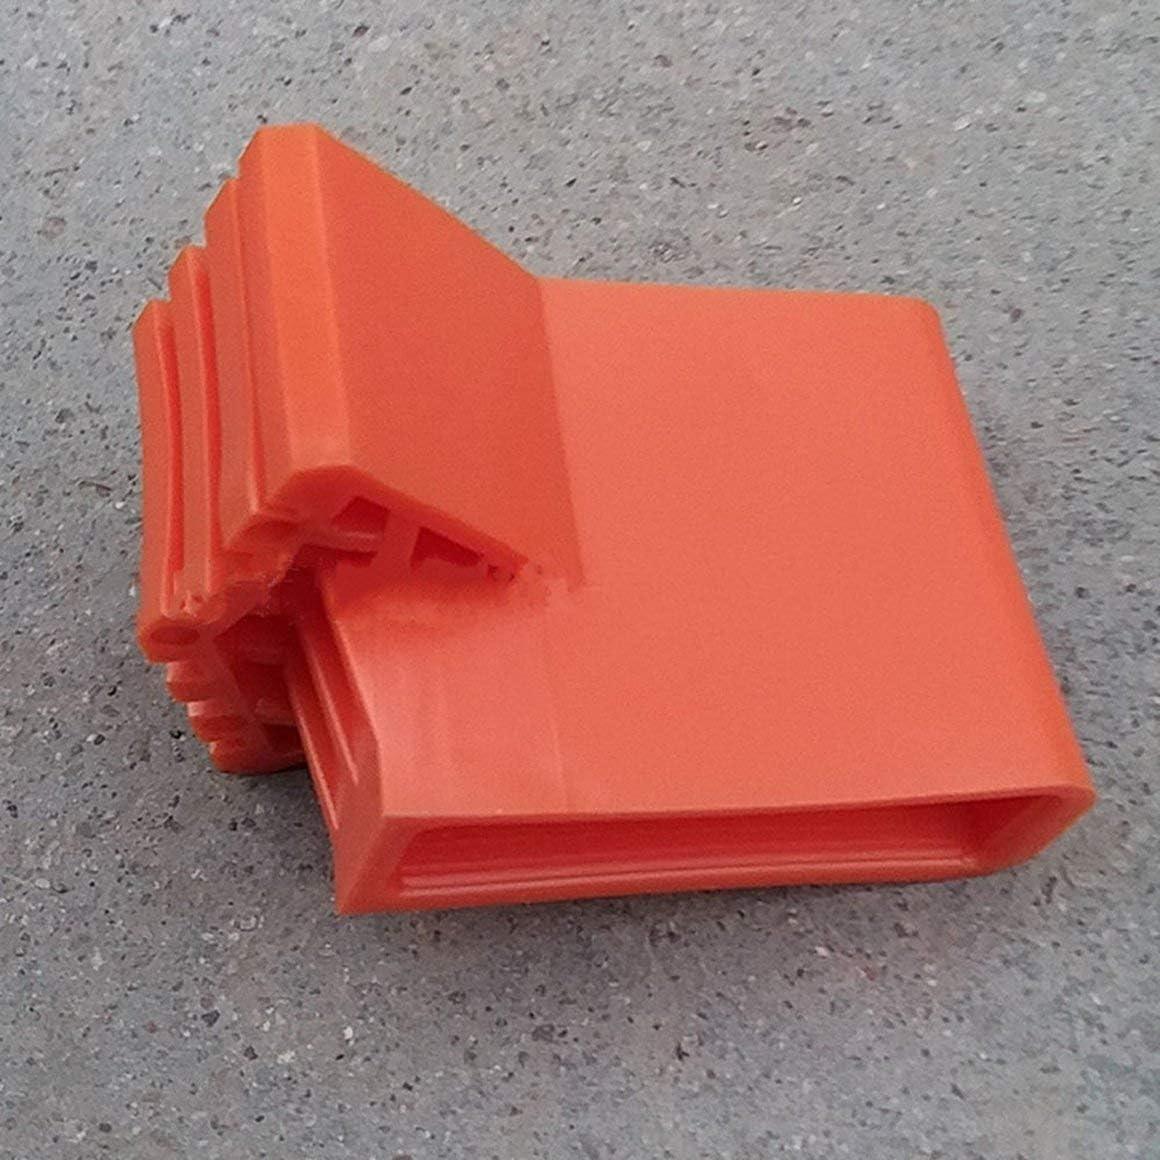 Paperllong/® Leiter Runde Fu/ßabdeckung Exquisite Langlebige Multifunktions-Faltleiter F/ächerf/örmige Fu/ßabdeckung Antirutschmatte